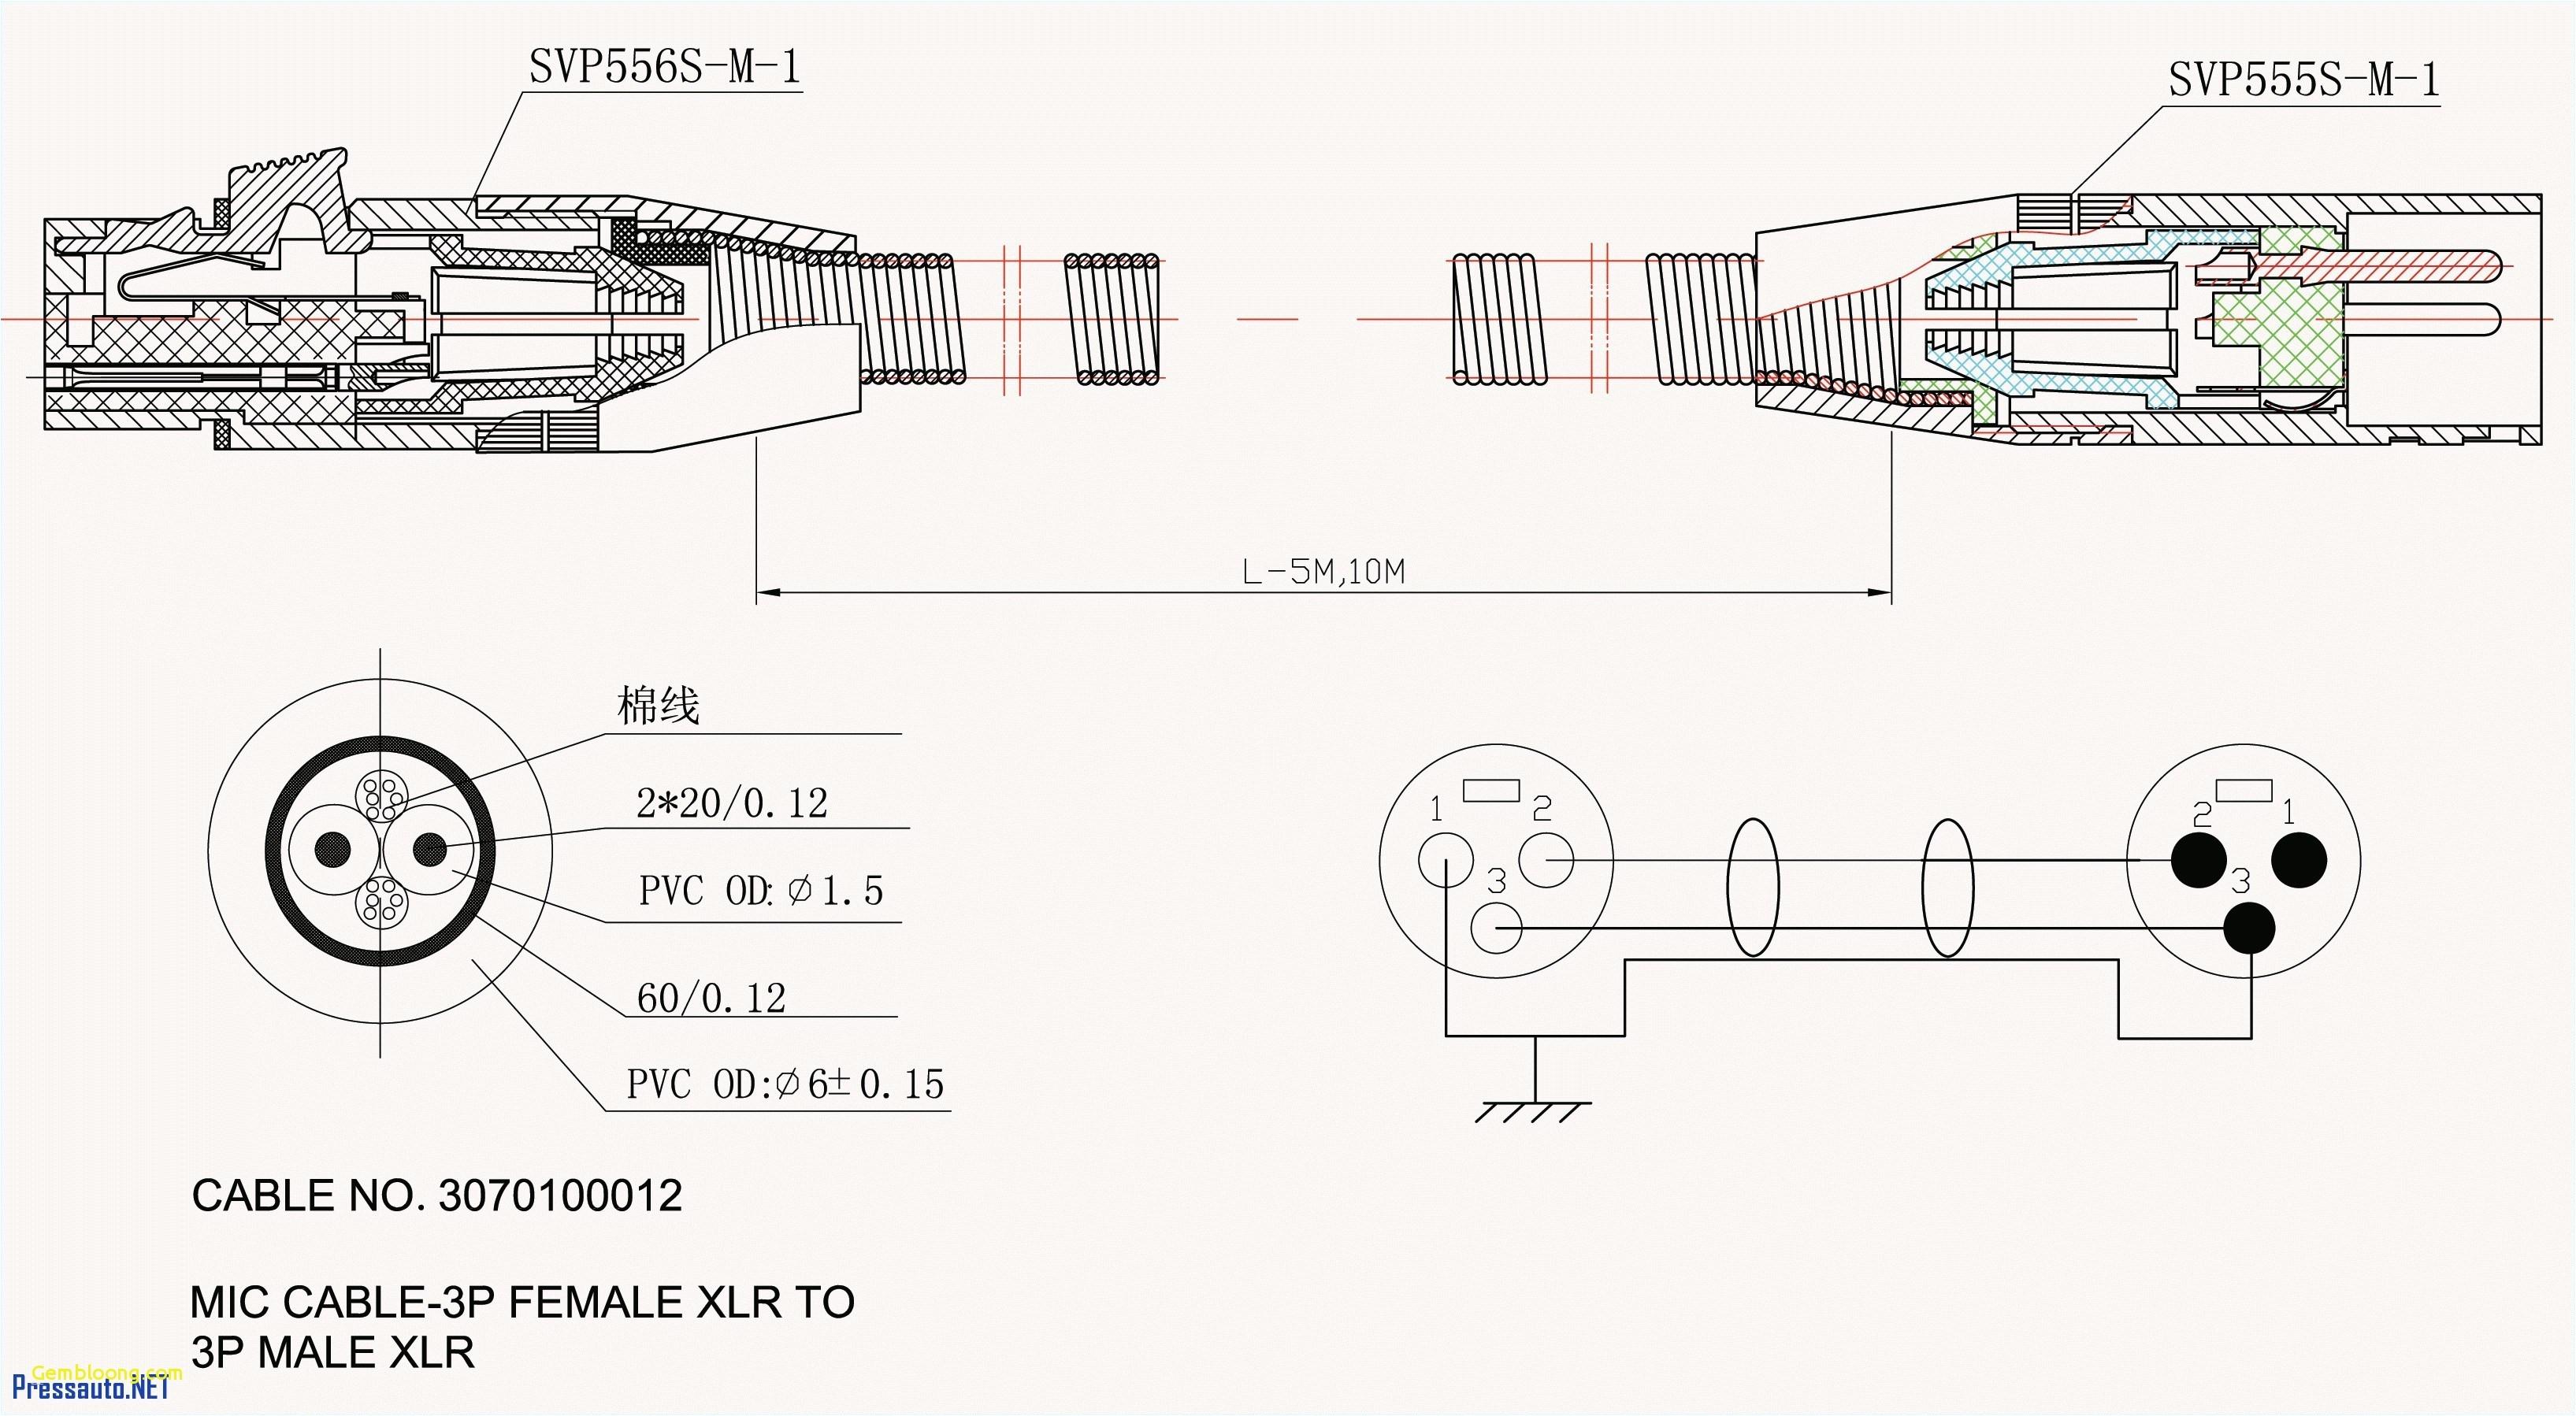 e36 headlight harness diagram wiring diagram expert electrical diagram bmw e36 circuit diagrams